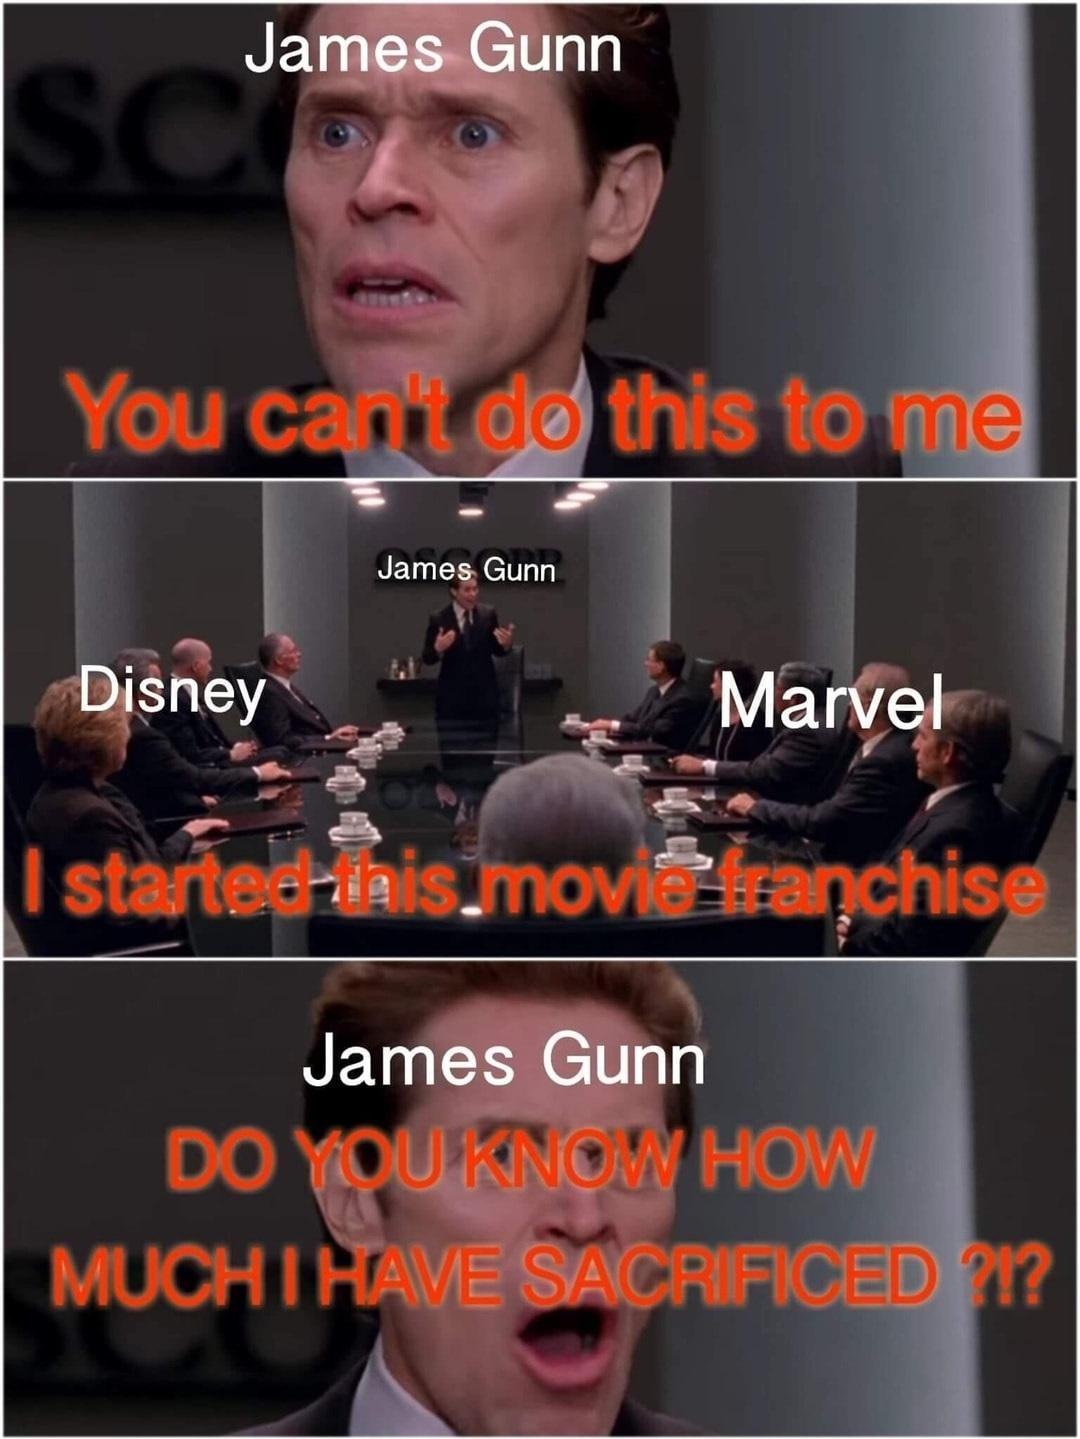 James Gunn's Sacrifice